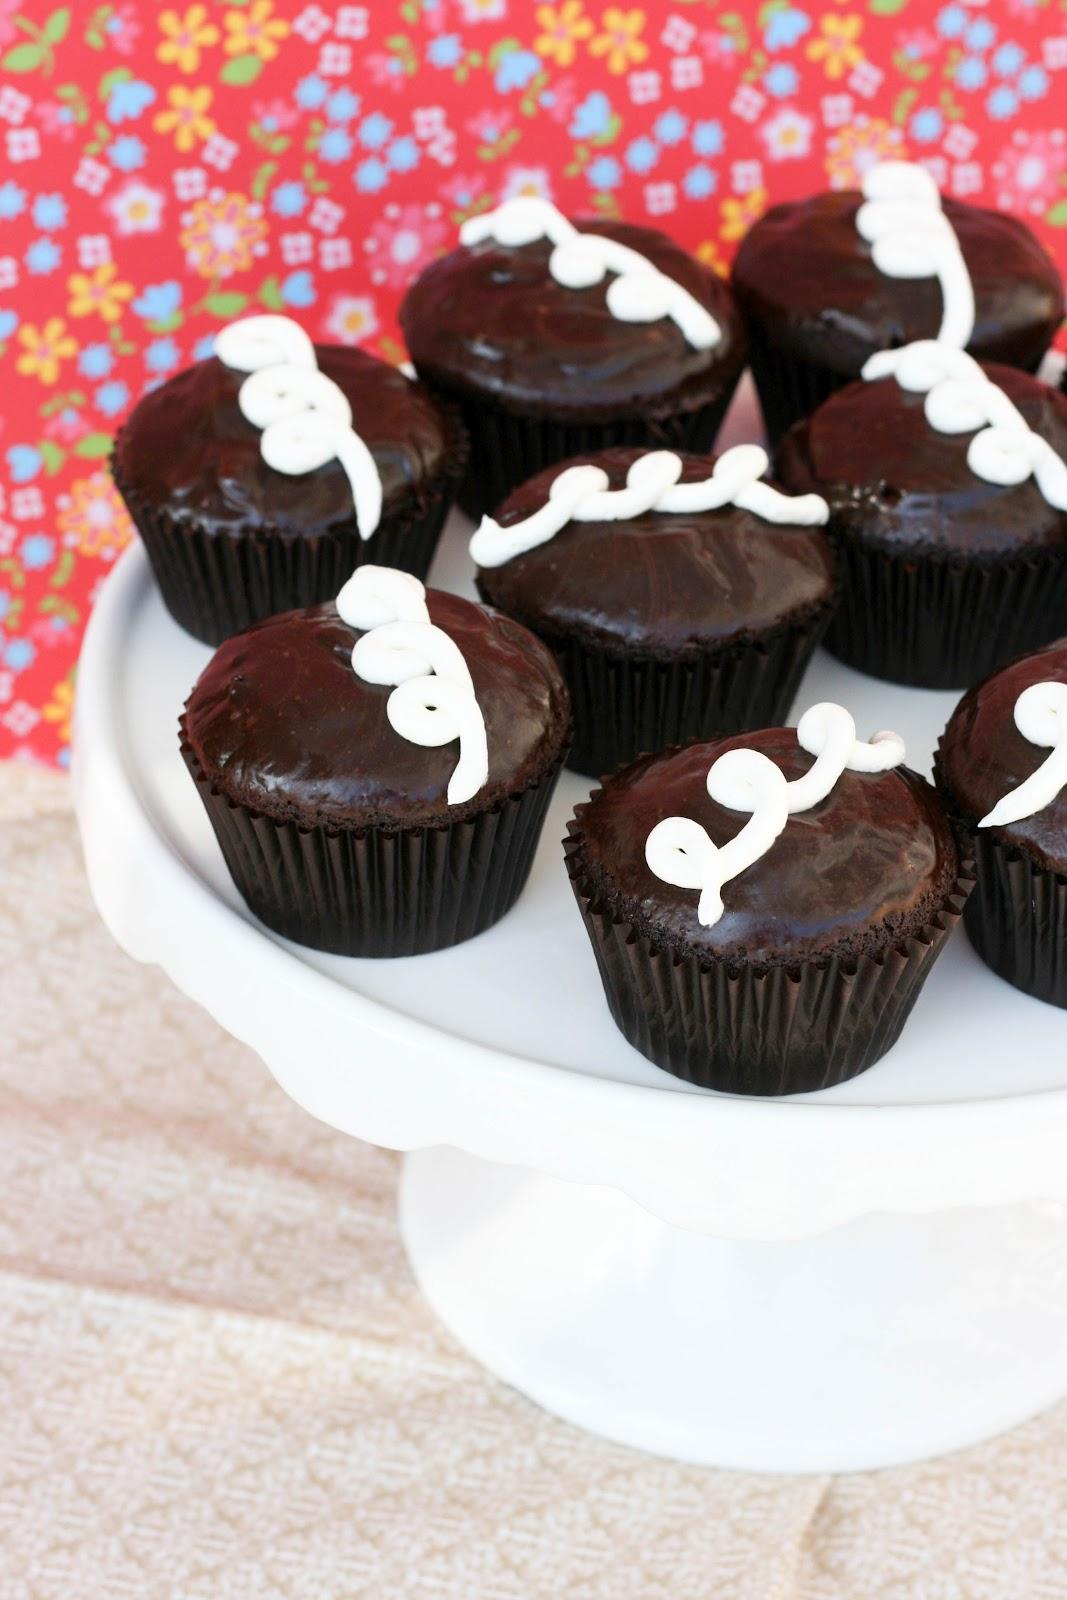 Homemade Hostess Cupcakes | Krissy's Creations